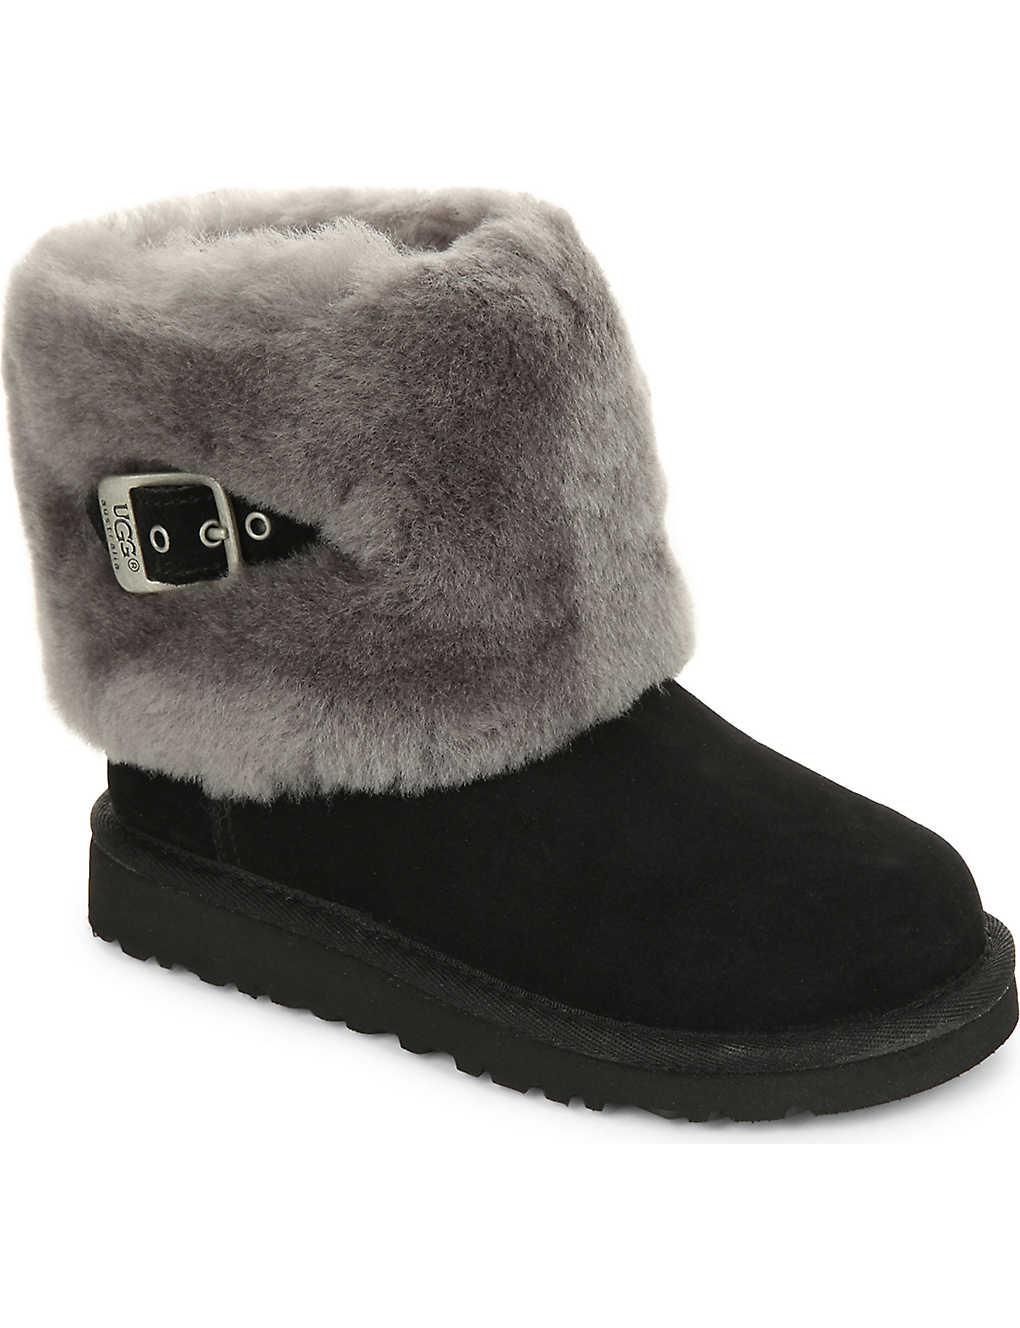 6ebb27c55ab UGG - Ellee suede boots 7-10 years | Selfridges.com